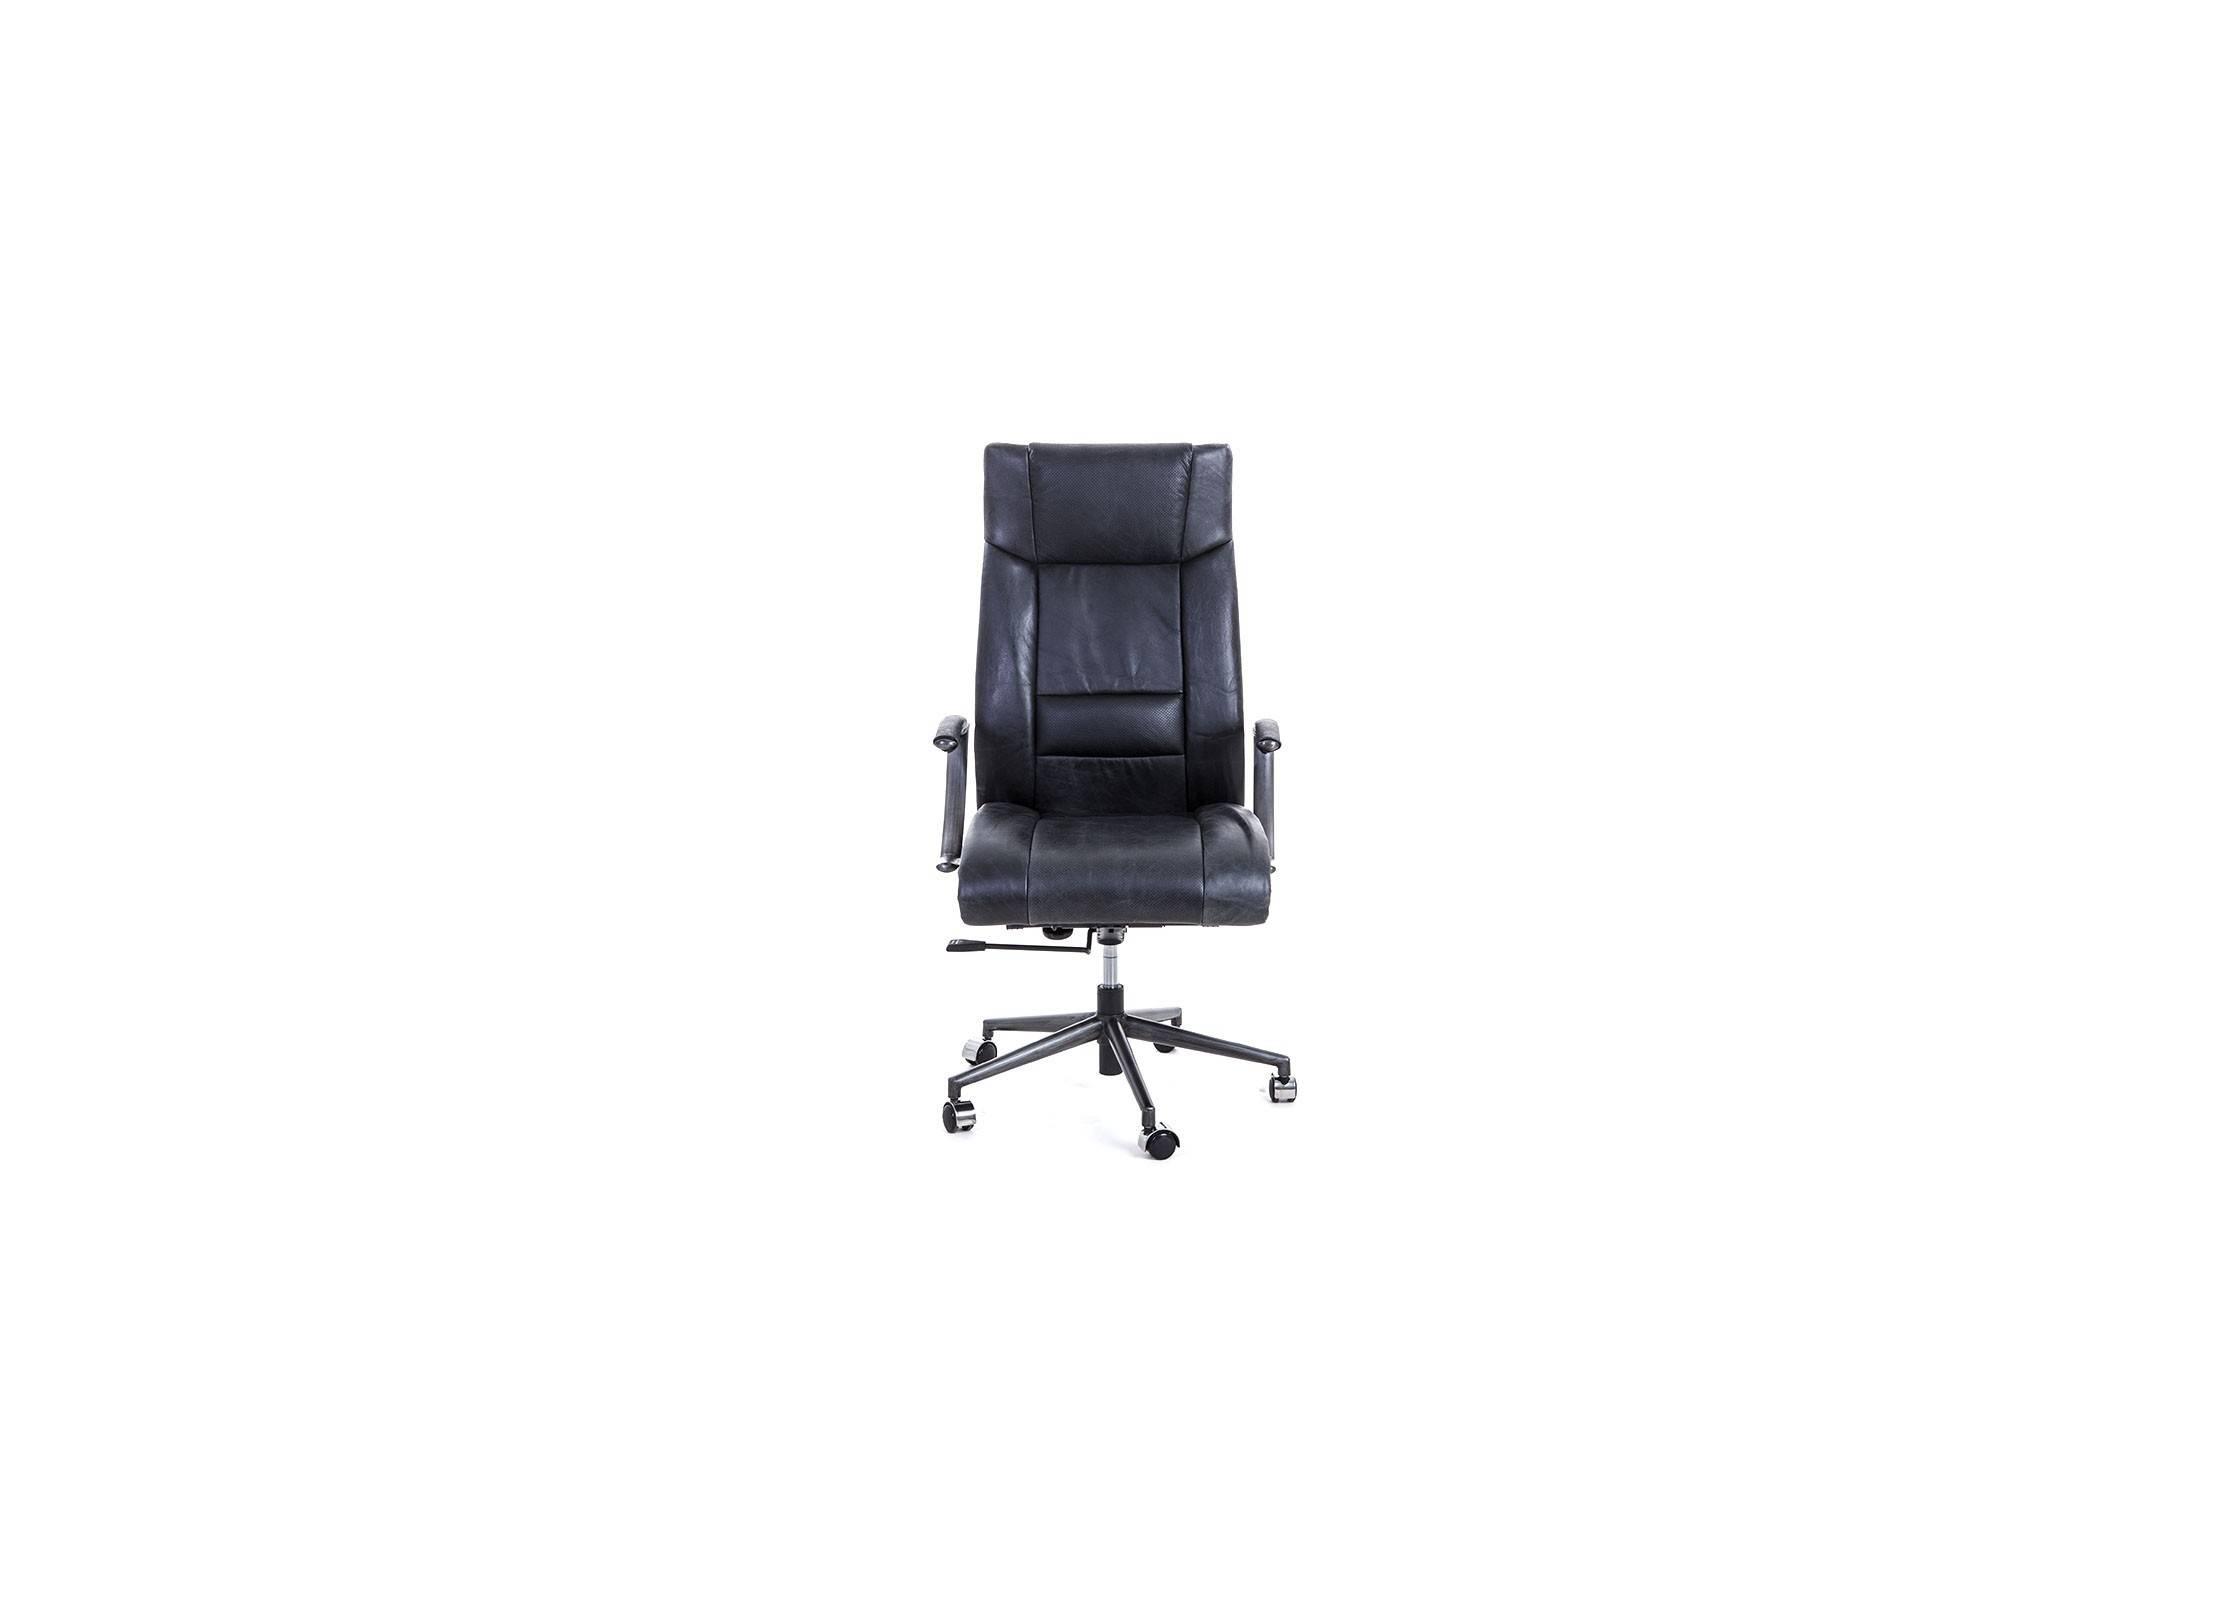 Noir tissus design gris mesh bleu beige tissu chaise fauteuil